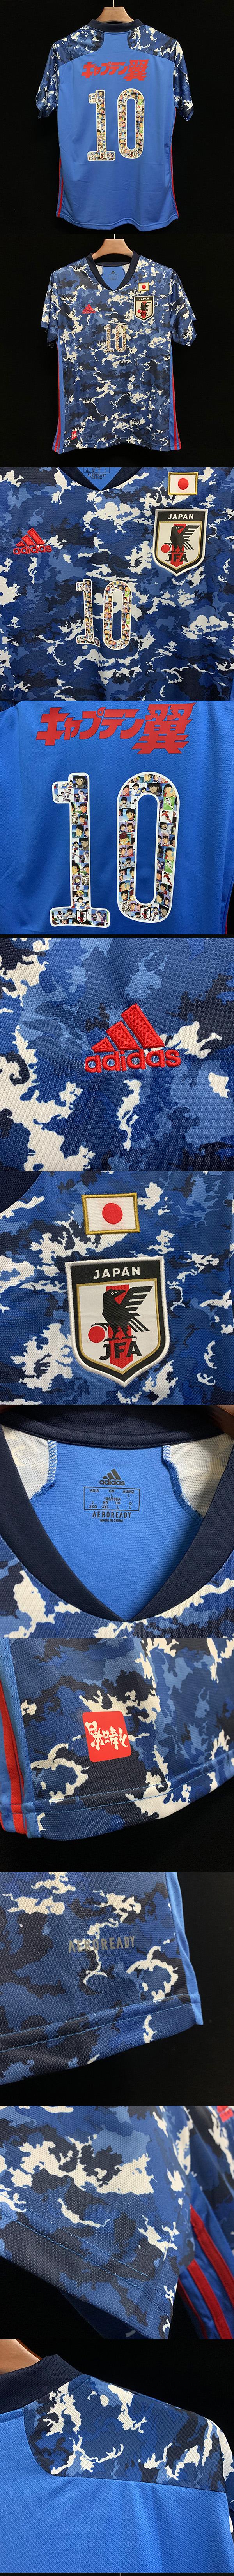 CAPTAIN TSUBASA #10 Japan 2020 Home Soccer Jersey Shirt